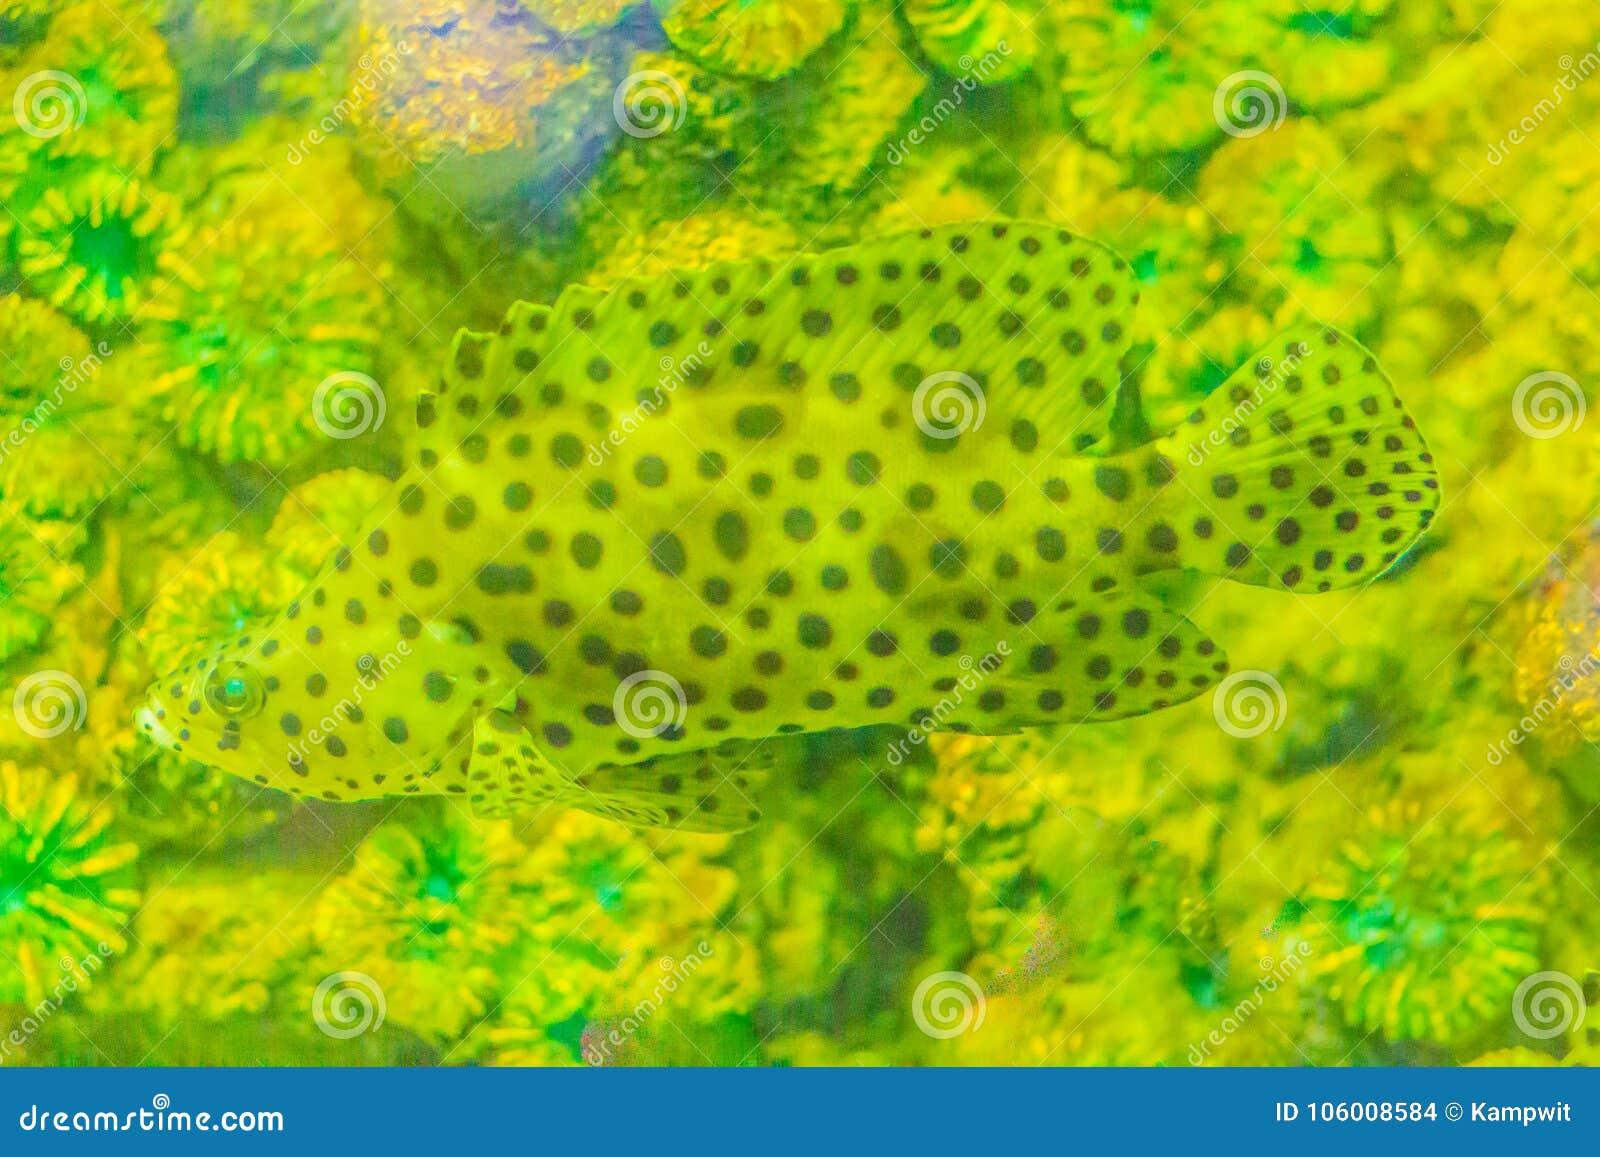 Mero jorobado lindo, mero de la pantera, o bacalao del barramundi (Cromi